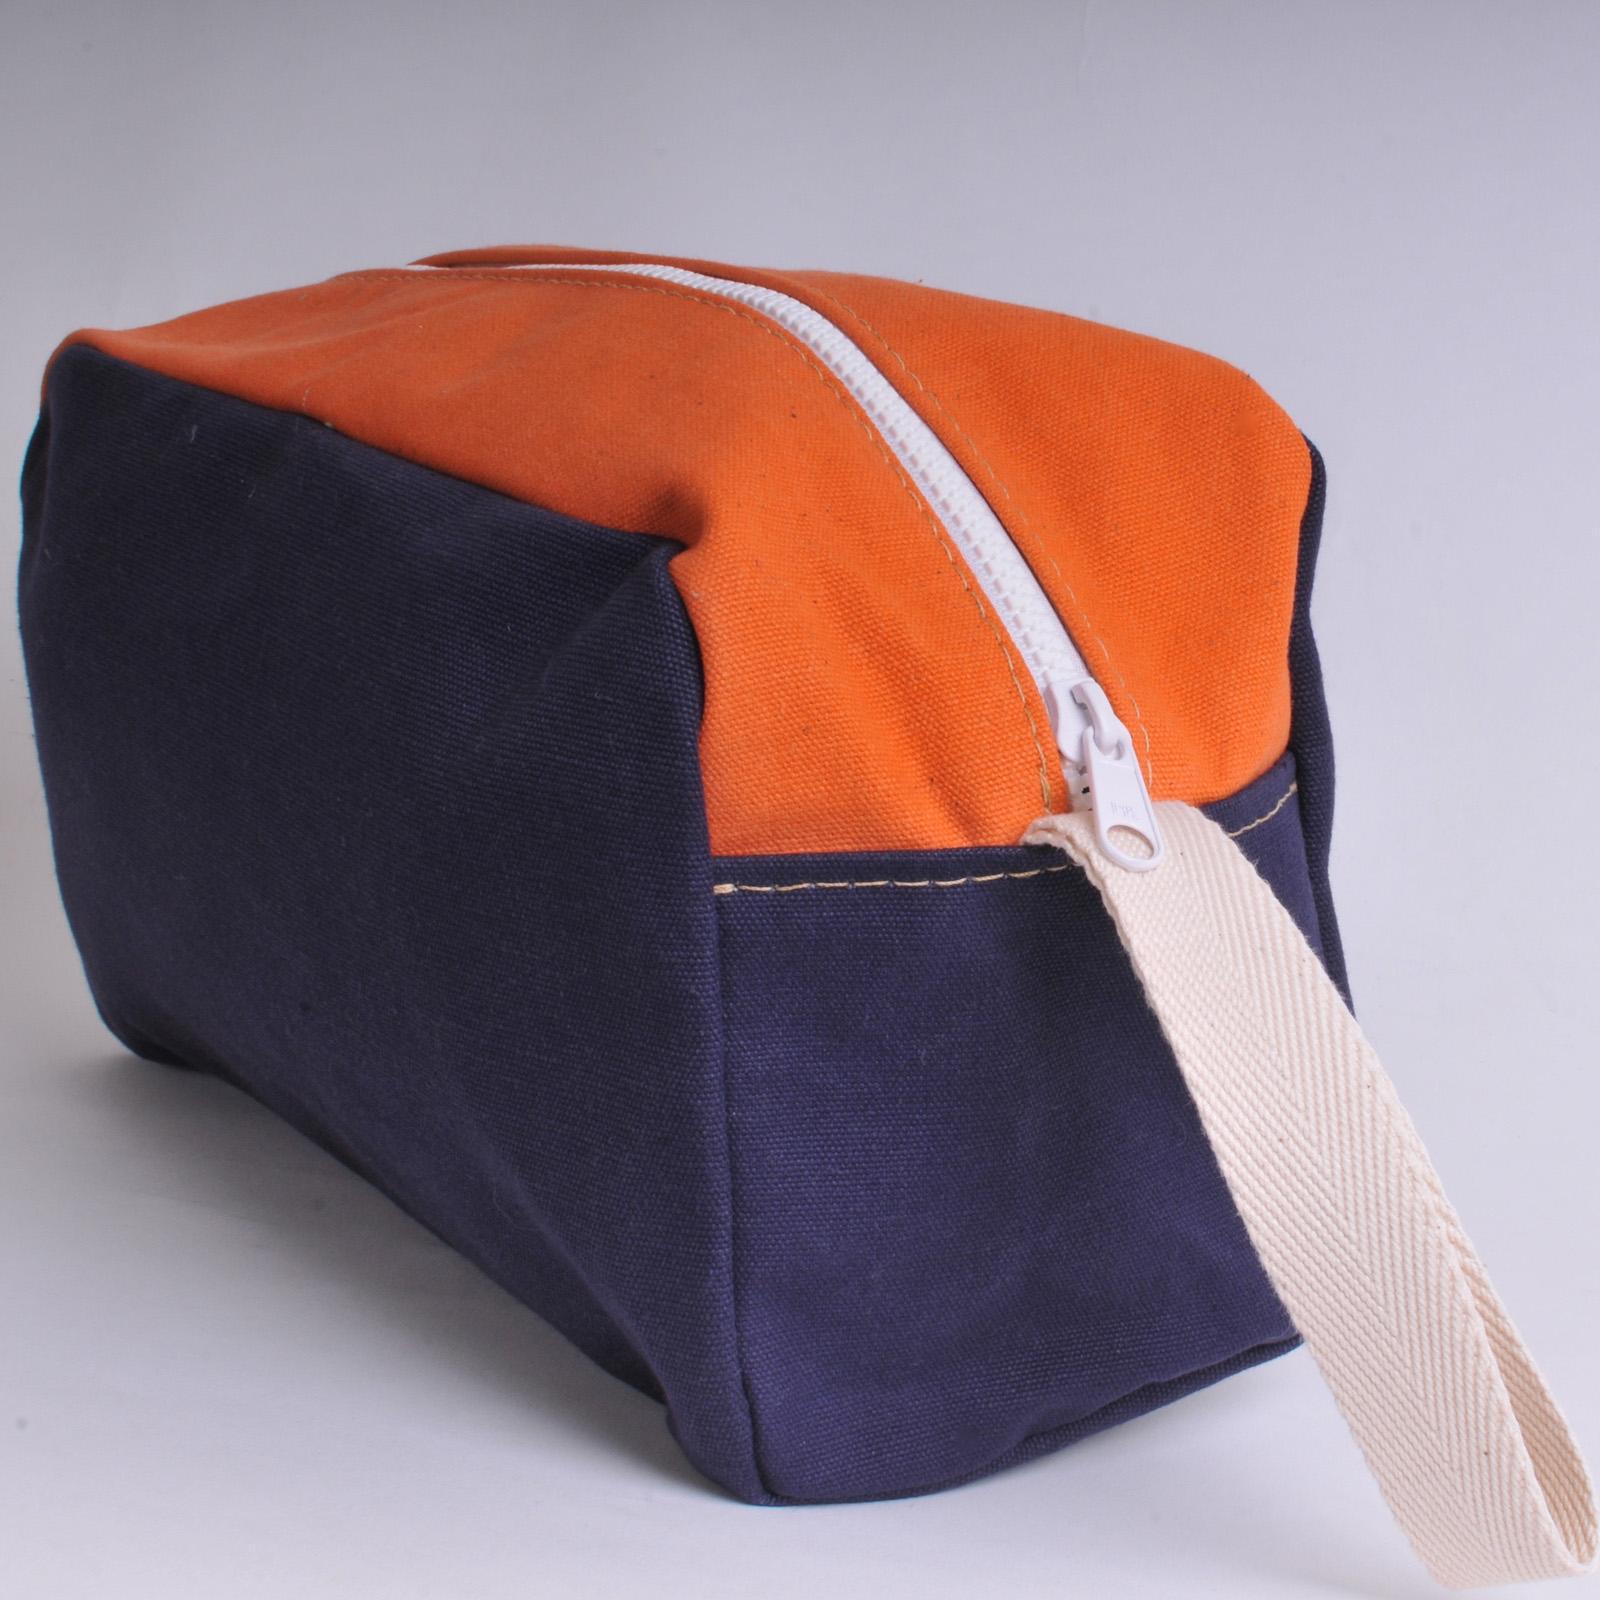 Washbags Wash Bag Navy Blue And Orange